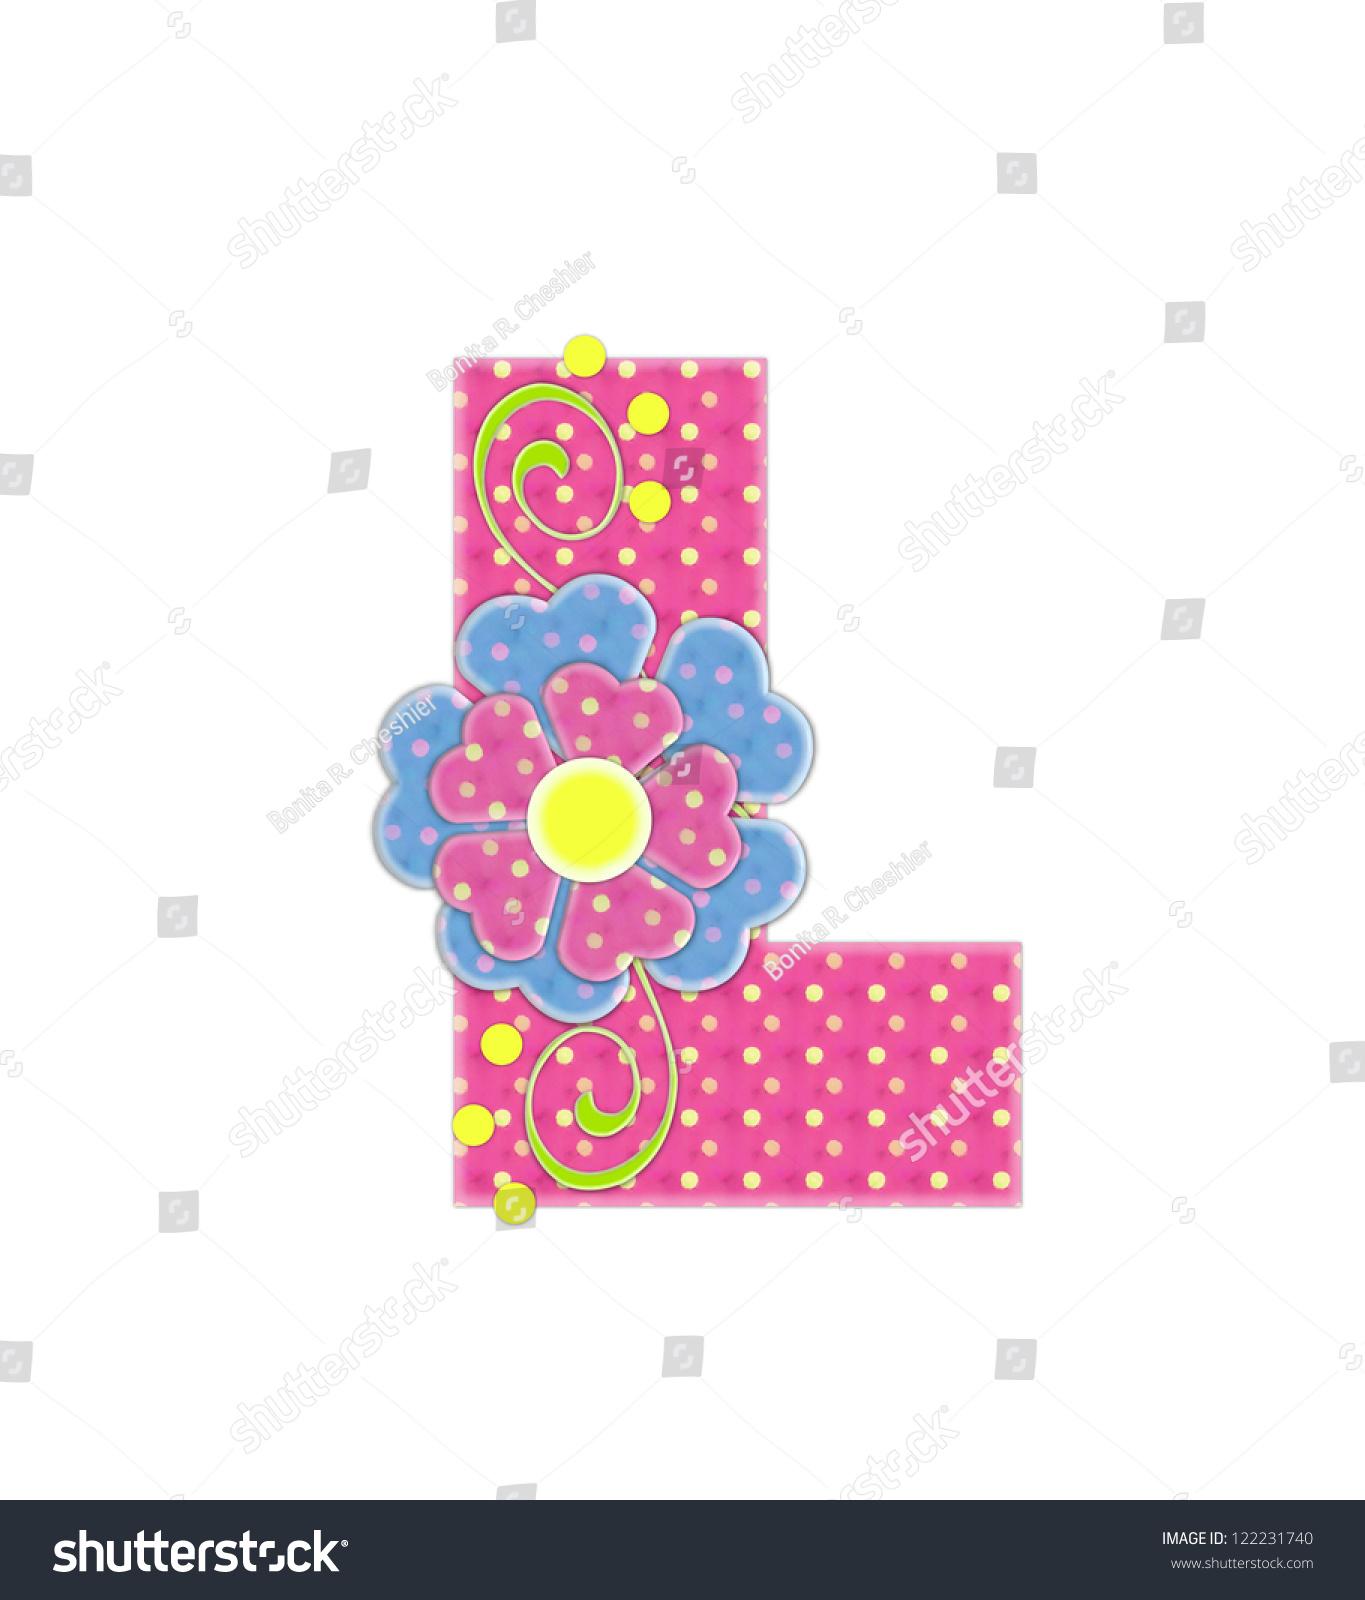 Royalty Free Stock Illustration of Letter L Alphabet Set Bonita Pink ...